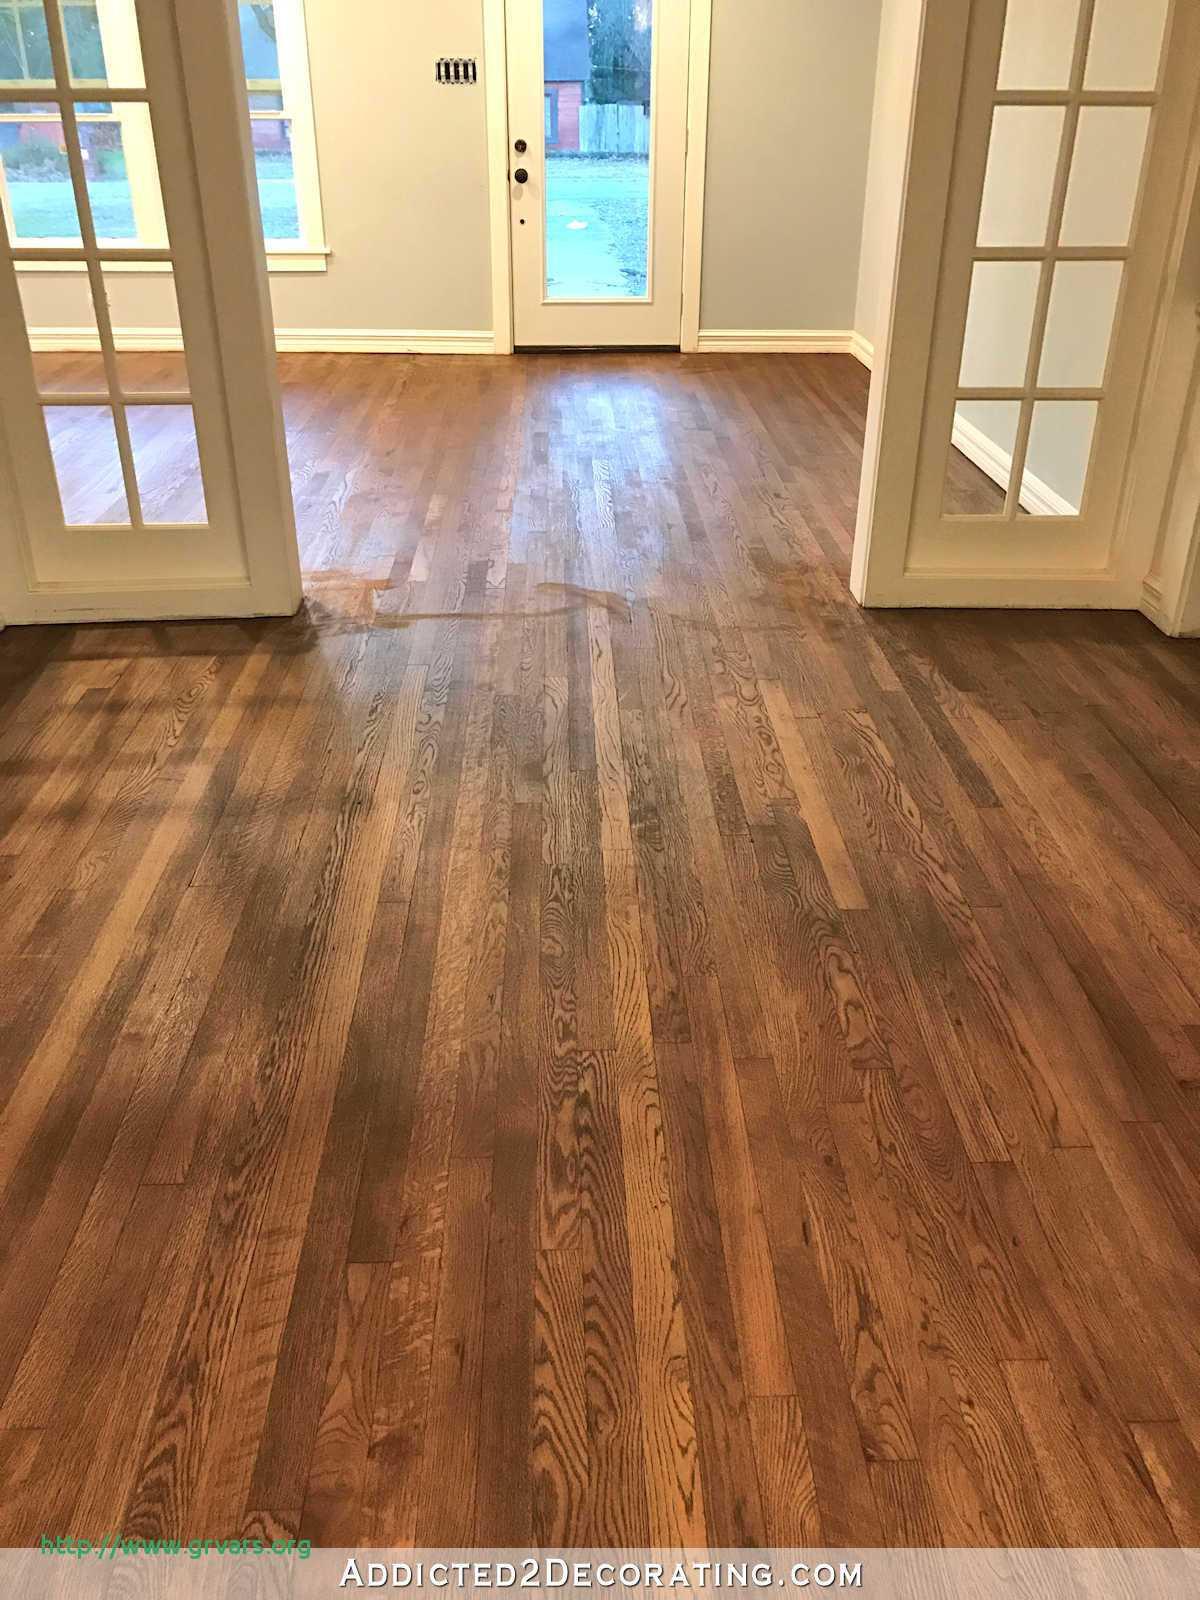 hardwood flooring 101 of 24 meilleur de best product to clean and shine hardwood floors within staining red oak hardwood floors 9 stain on entryway and music room floors